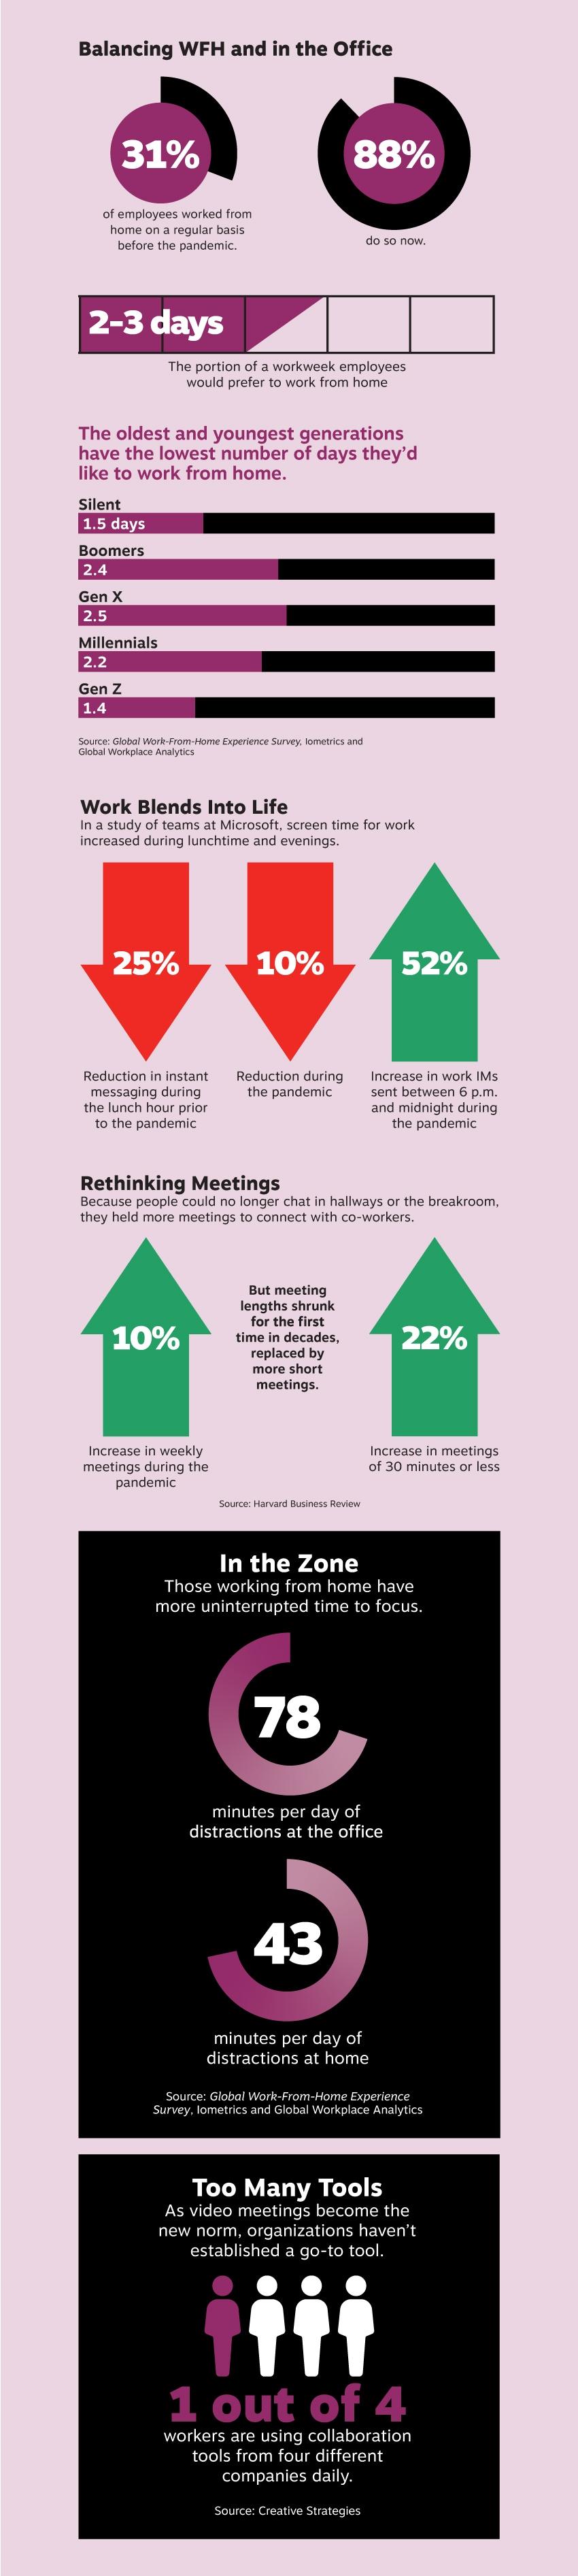 Your Changing Worklife Behaviors